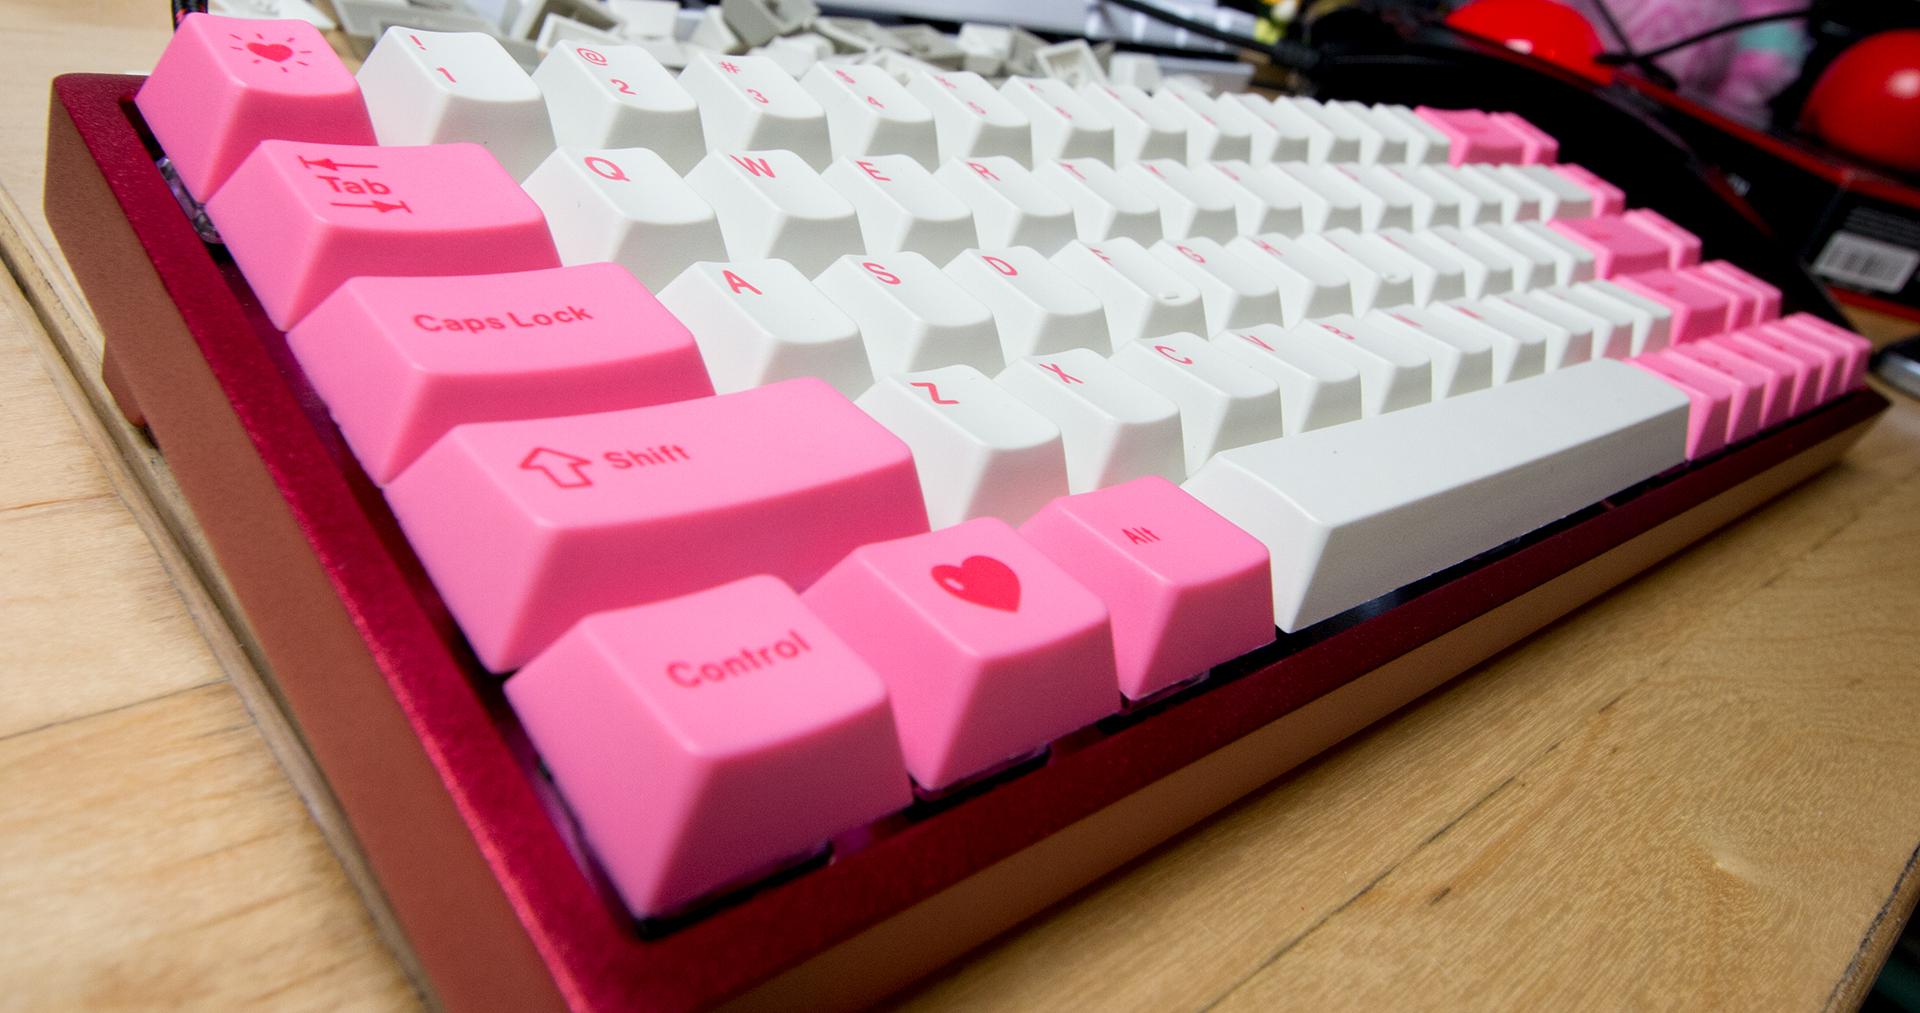 Pink & White Heart Keyboard  https://www.kotaku.com.au/2017/05/swapping-keycaps-is-the-key-to-having-a-pretty-keyboard/